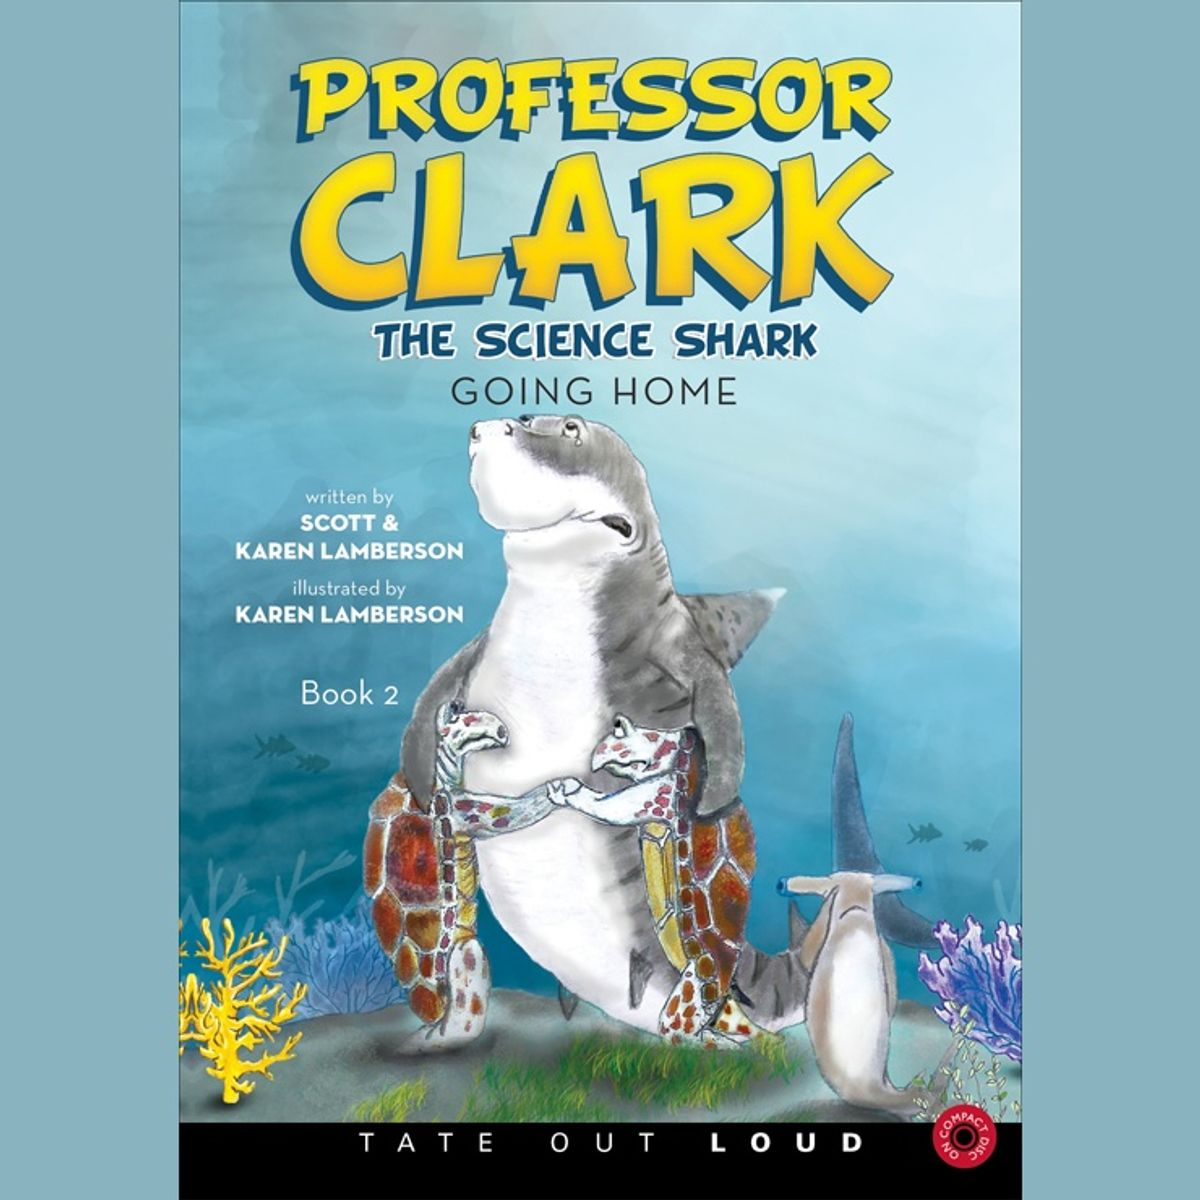 Professor Clark The Science Shark Going Home